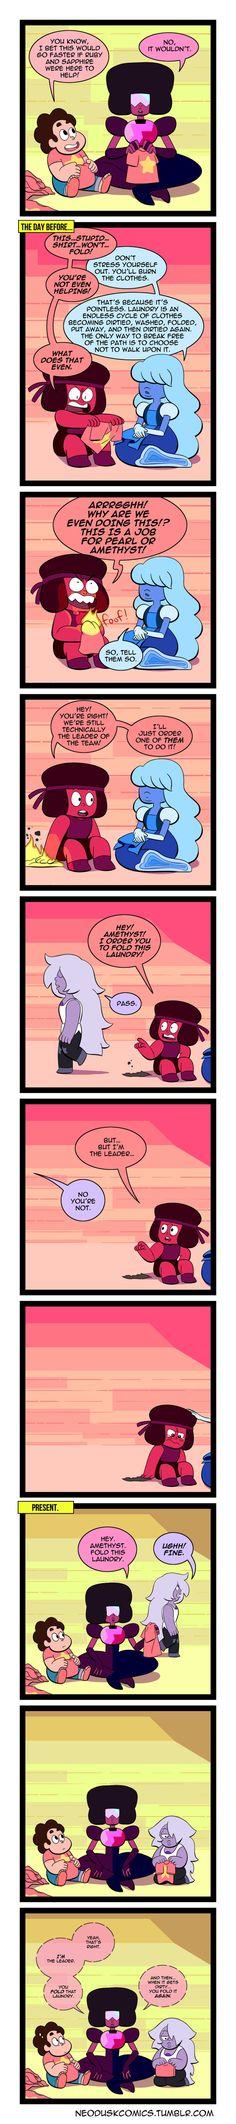 Steven Universe: One Head is Better Than Two by Neodusk on DeviantArt